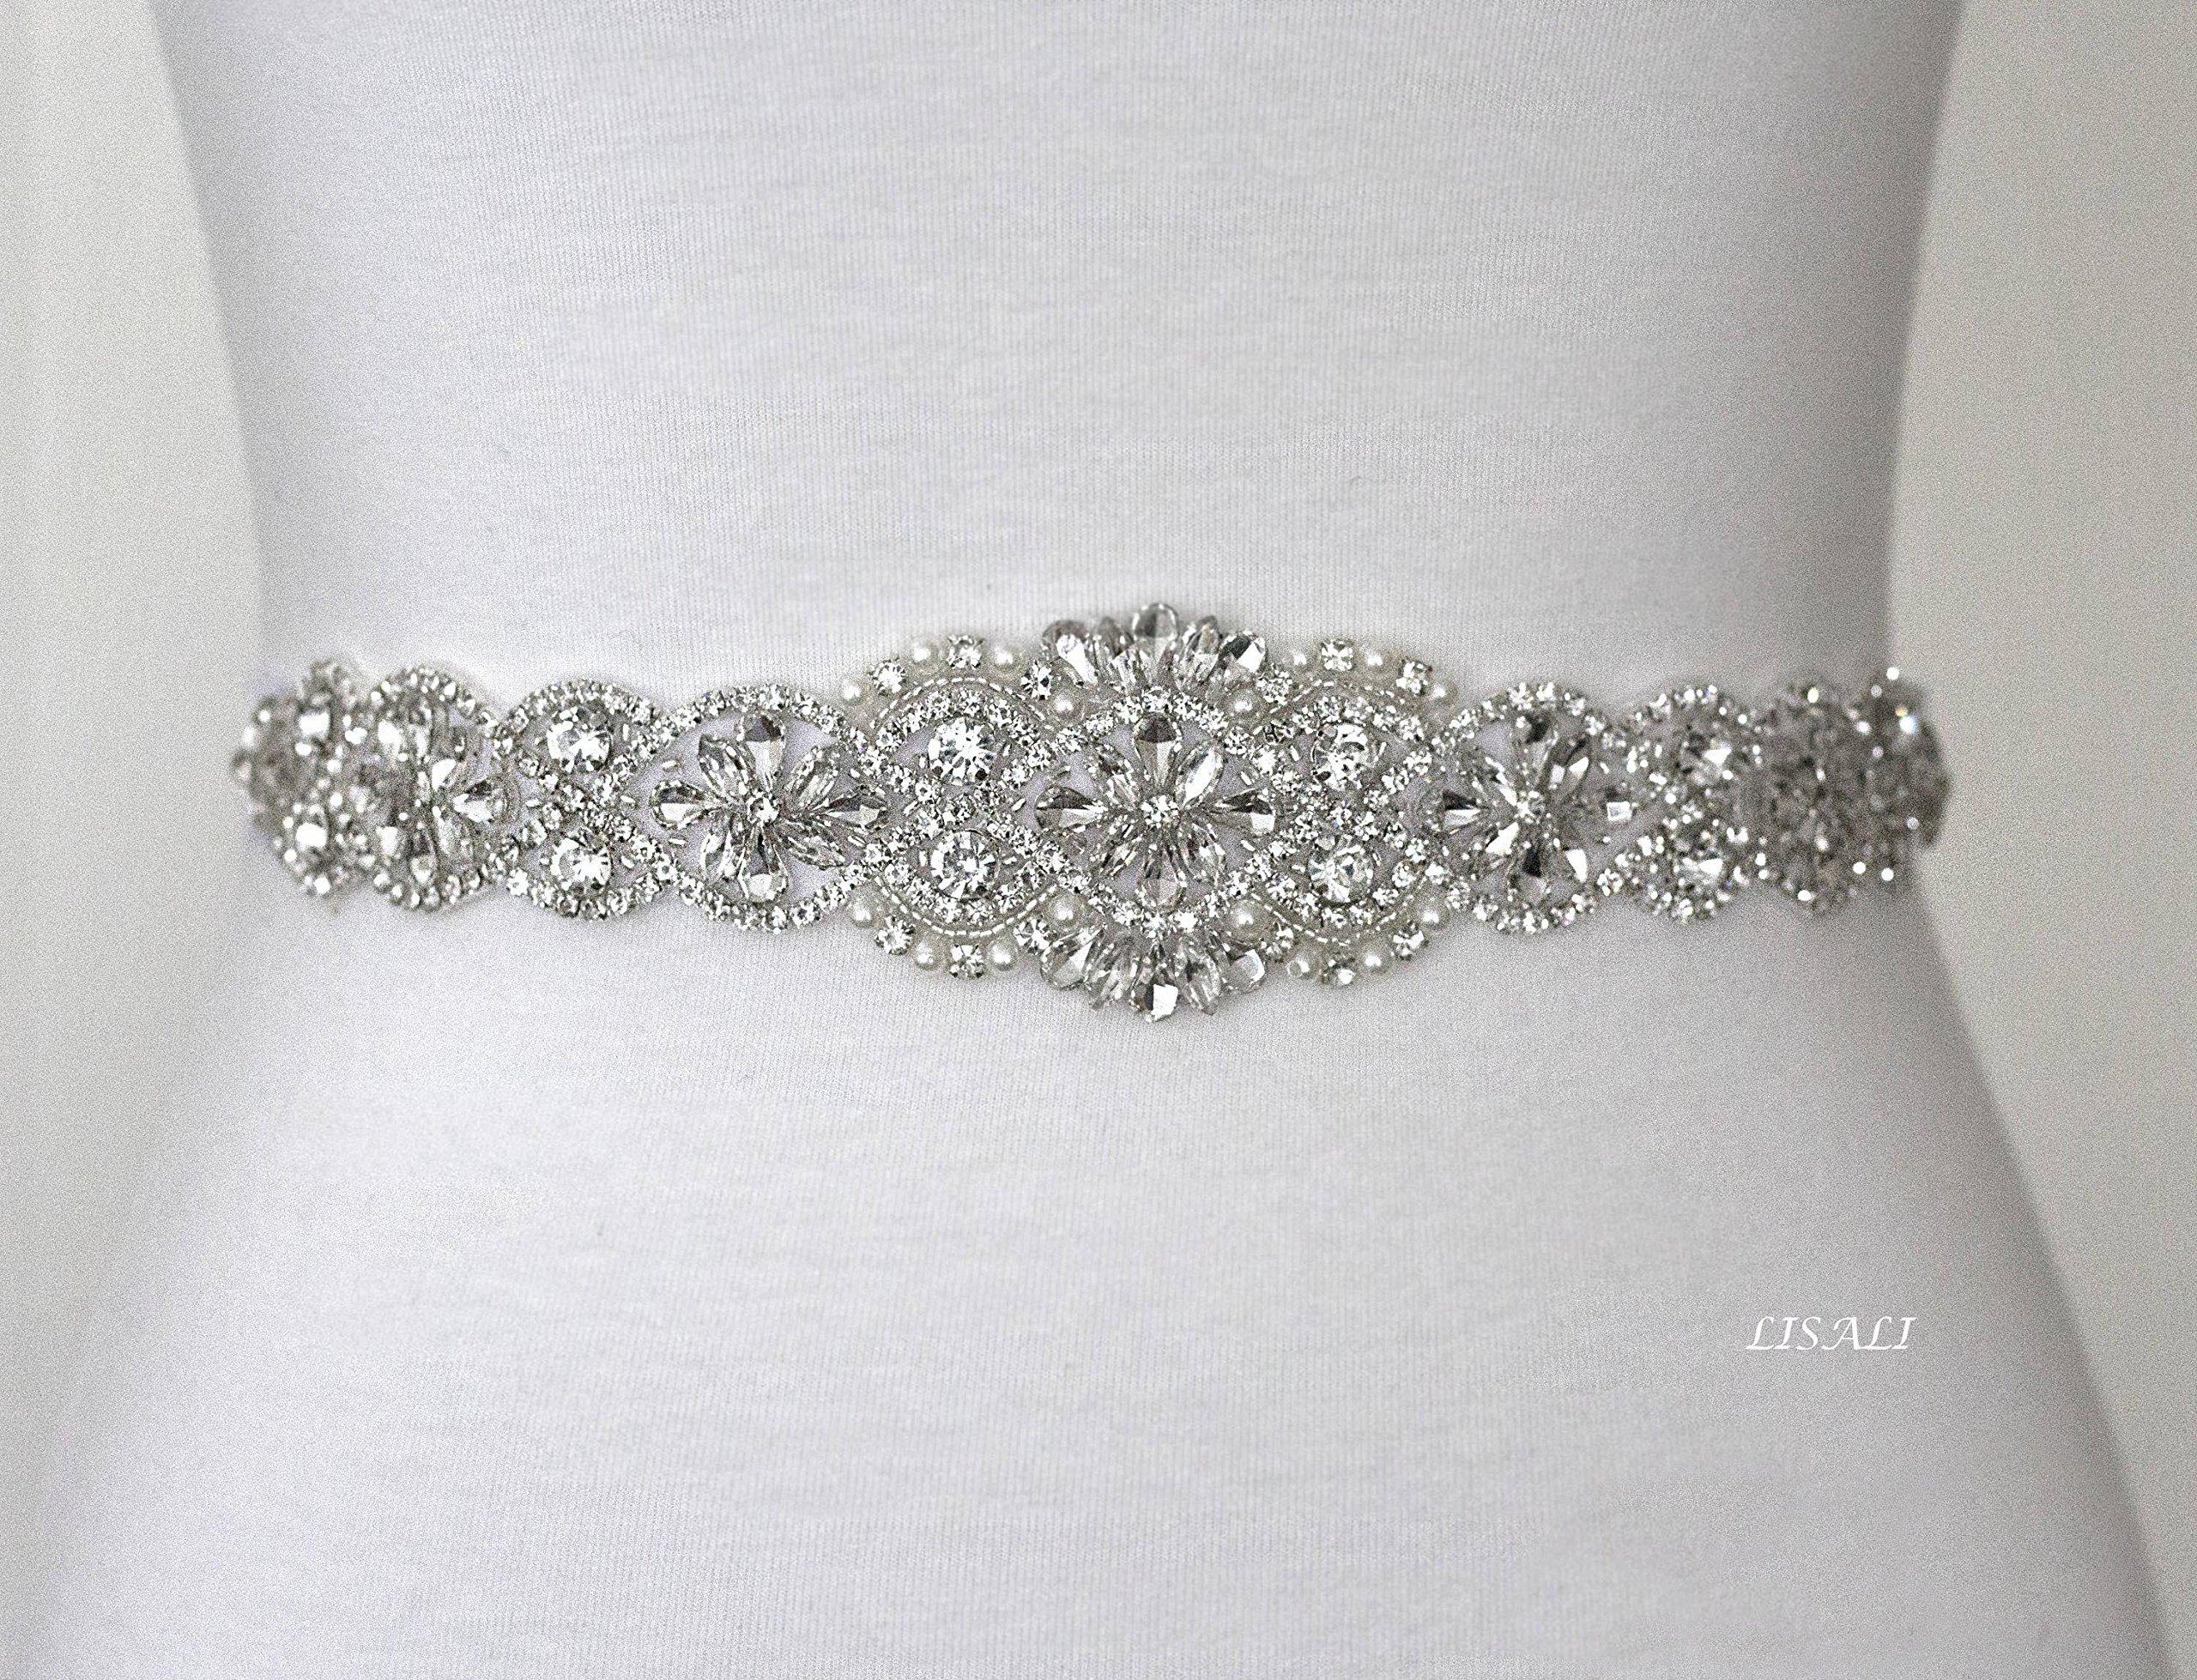 LISALI 17'' Sparkly Wedding Belt, Rhinestone Belt, Bridal Belts, Rhinestone Chain Belt, Crystal Sash Belt, Wedding Dress Belts Crystal